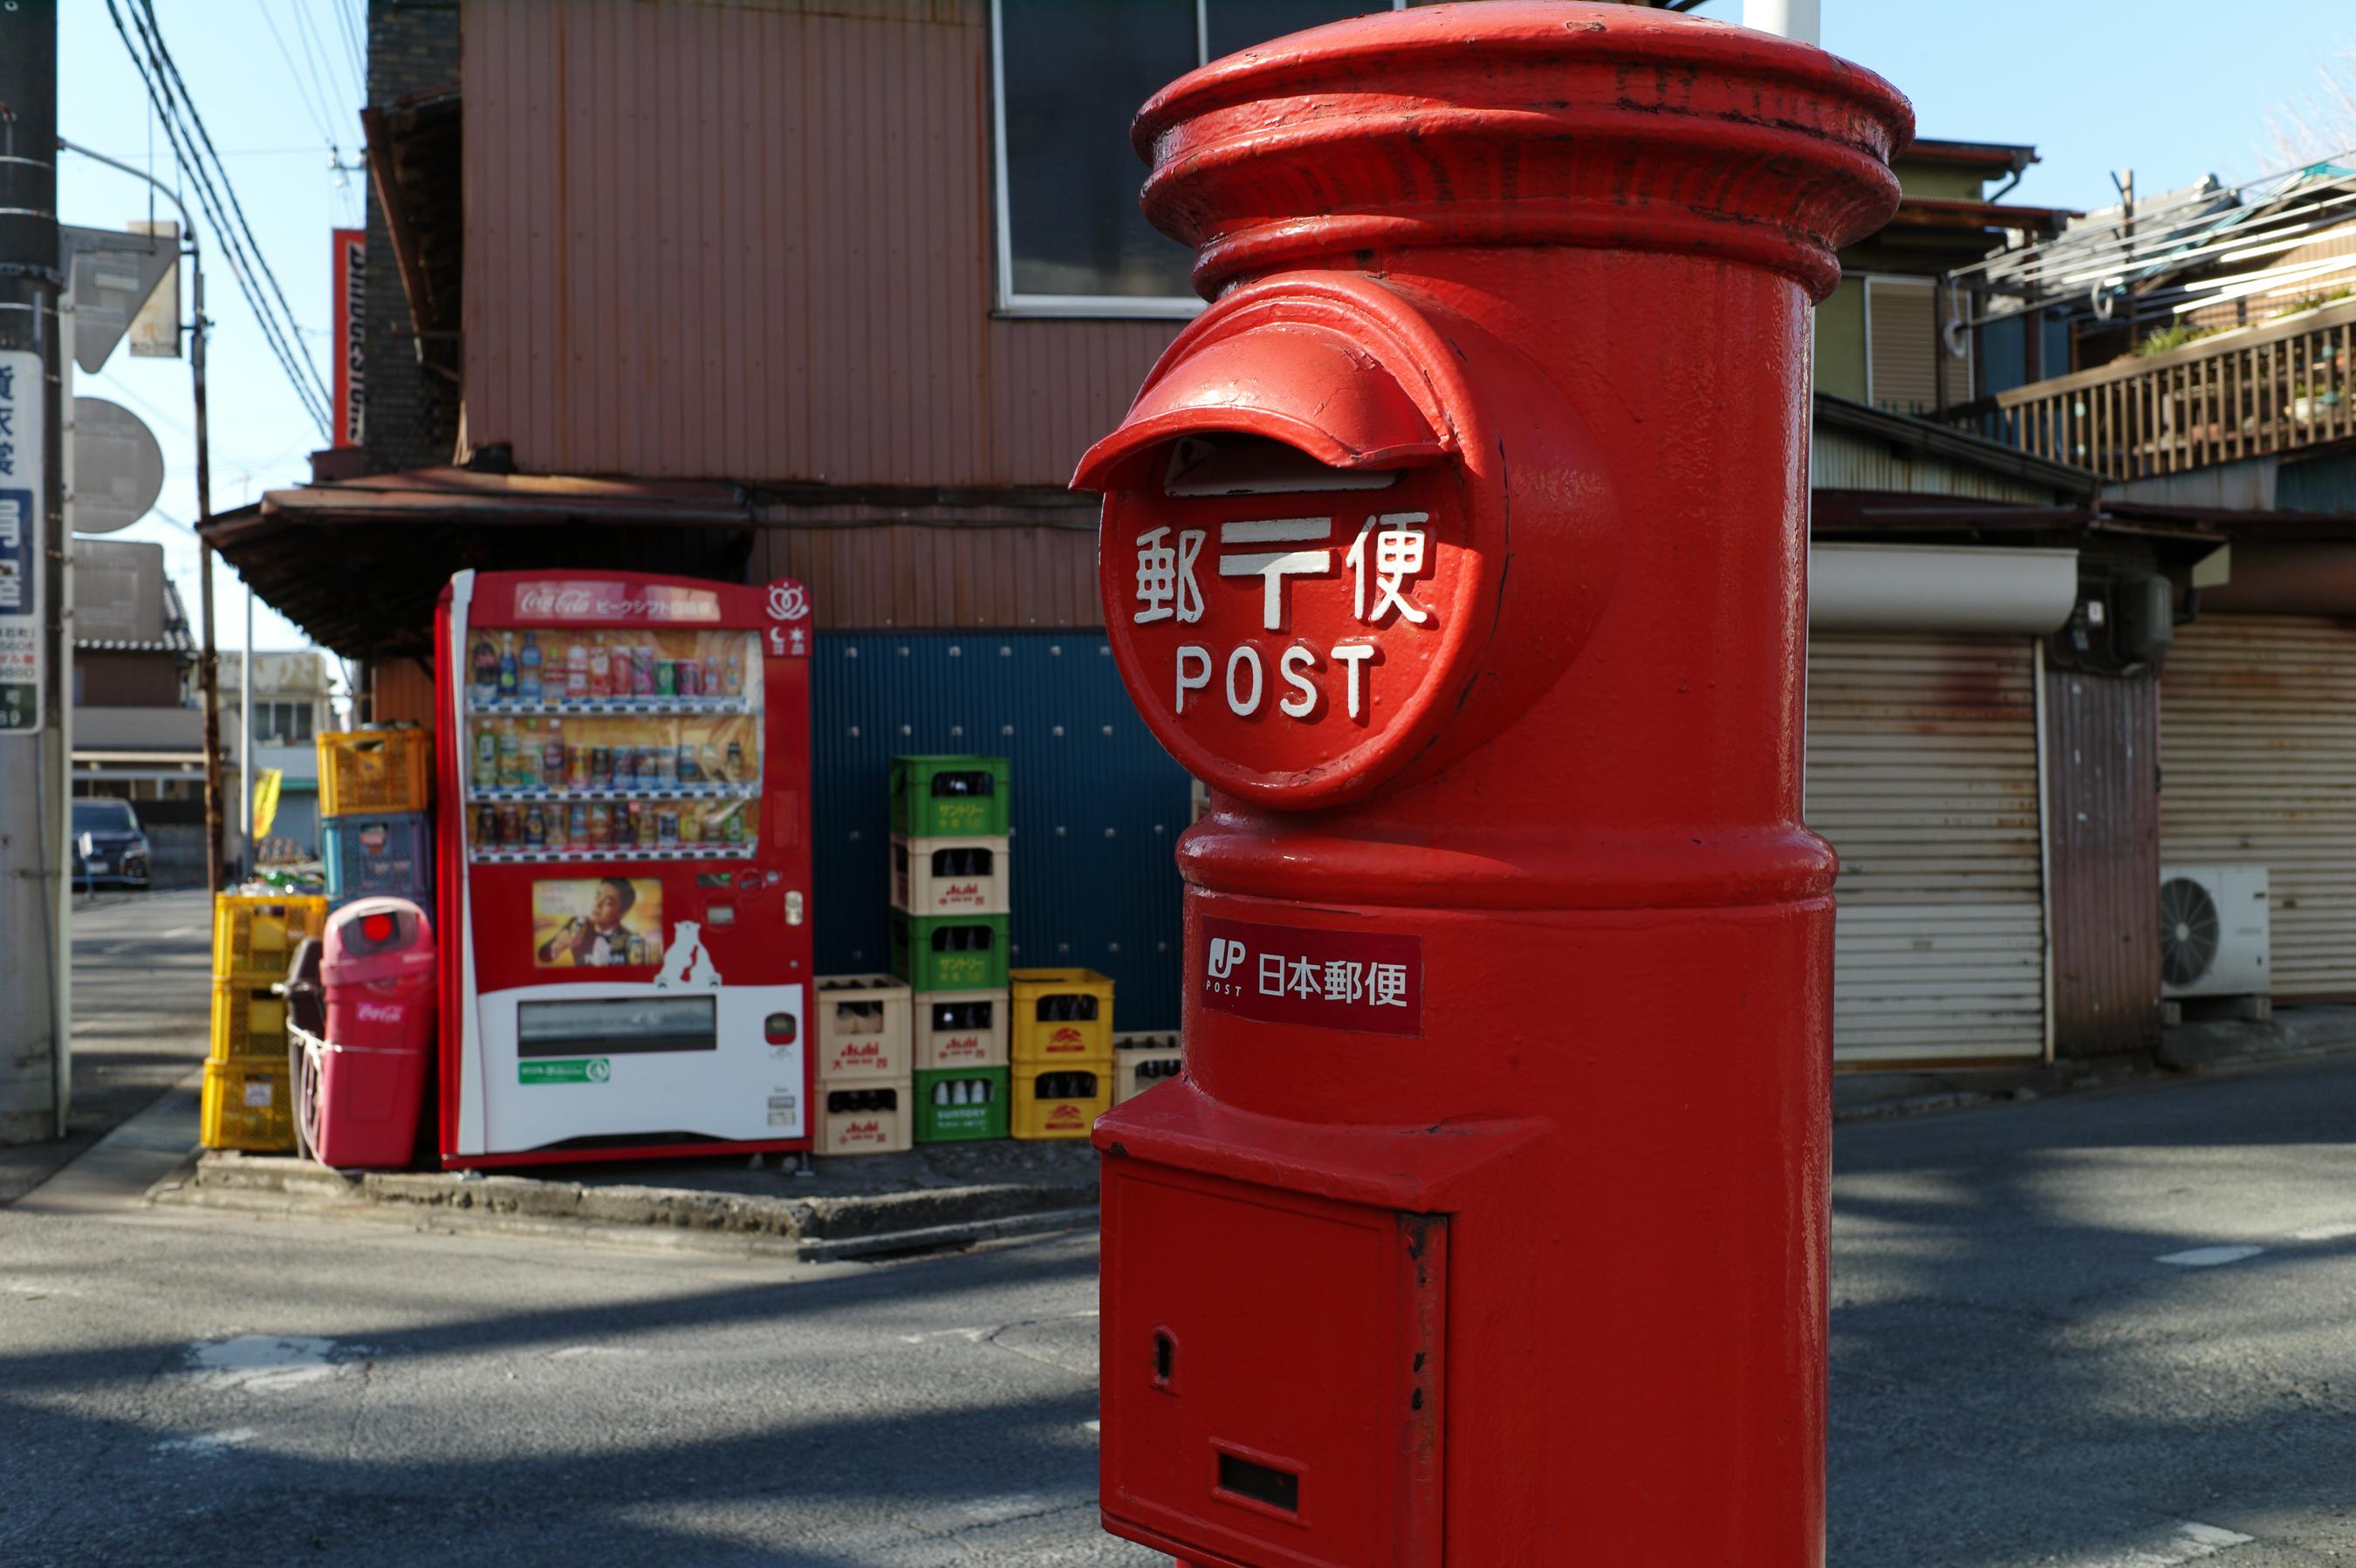 f:id:aoyama-takuro:20180212003750j:plain